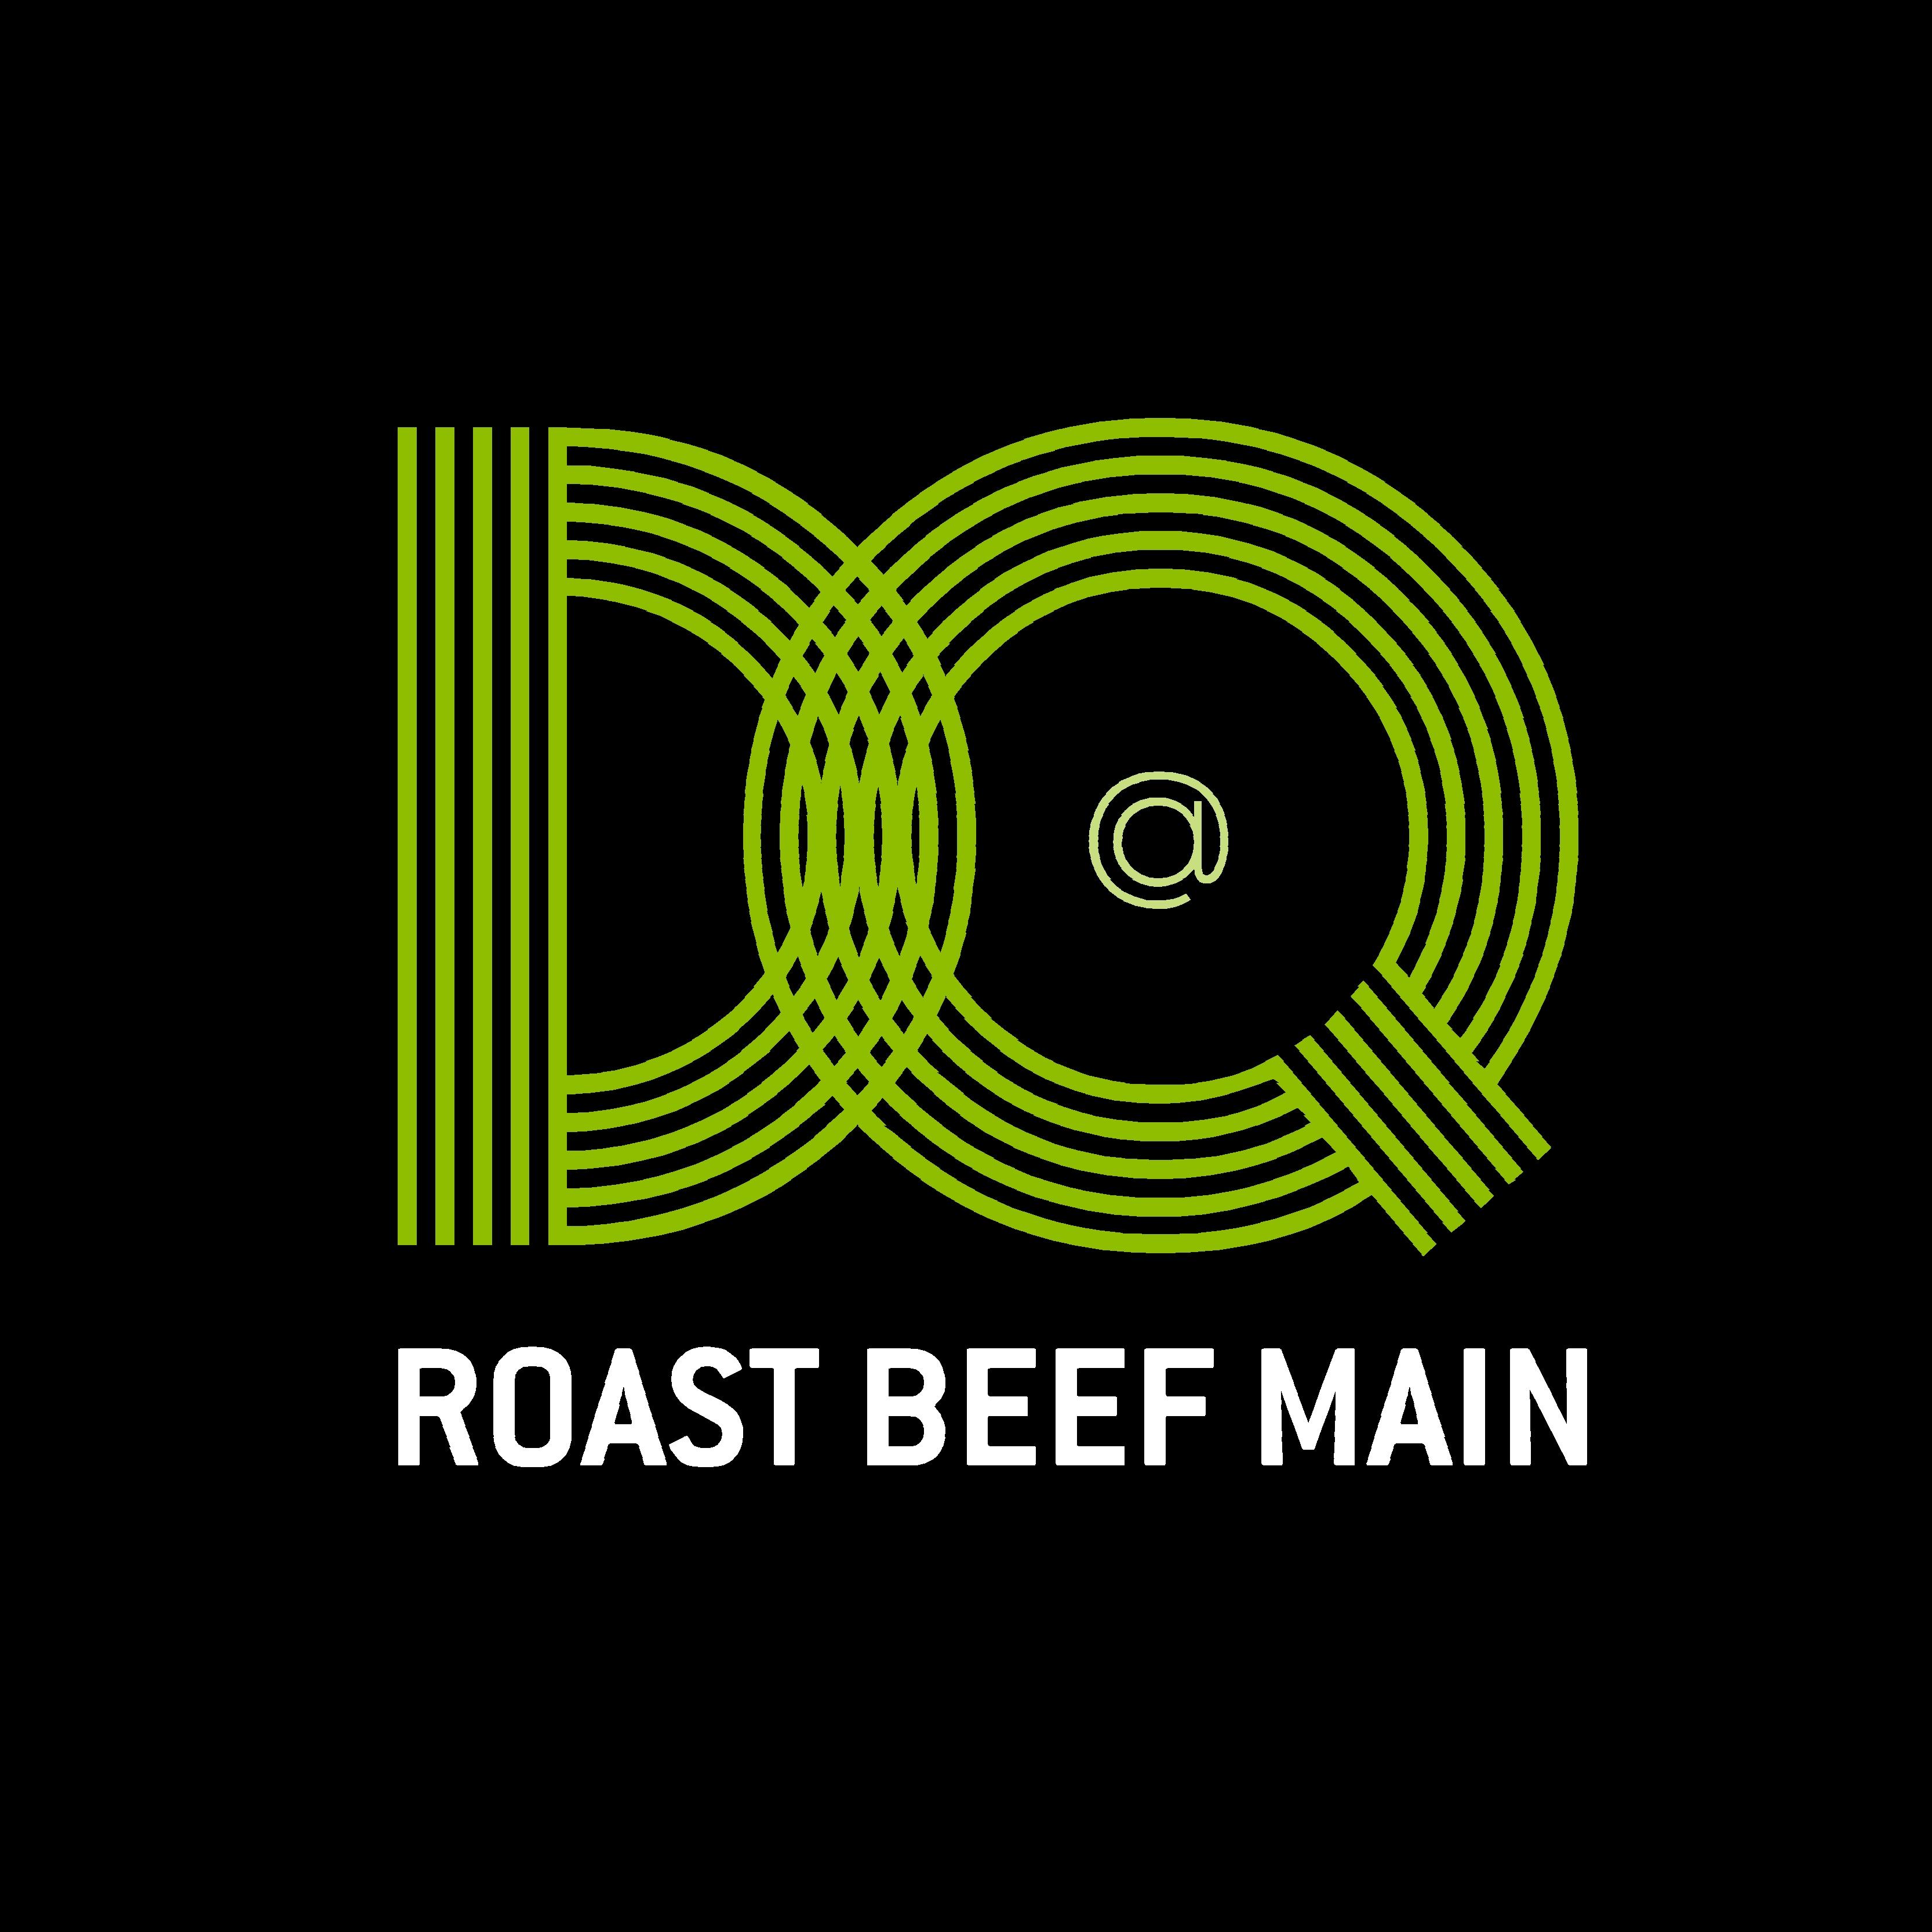 20. DQ - SUNDAY ROAST BEEF MAIN